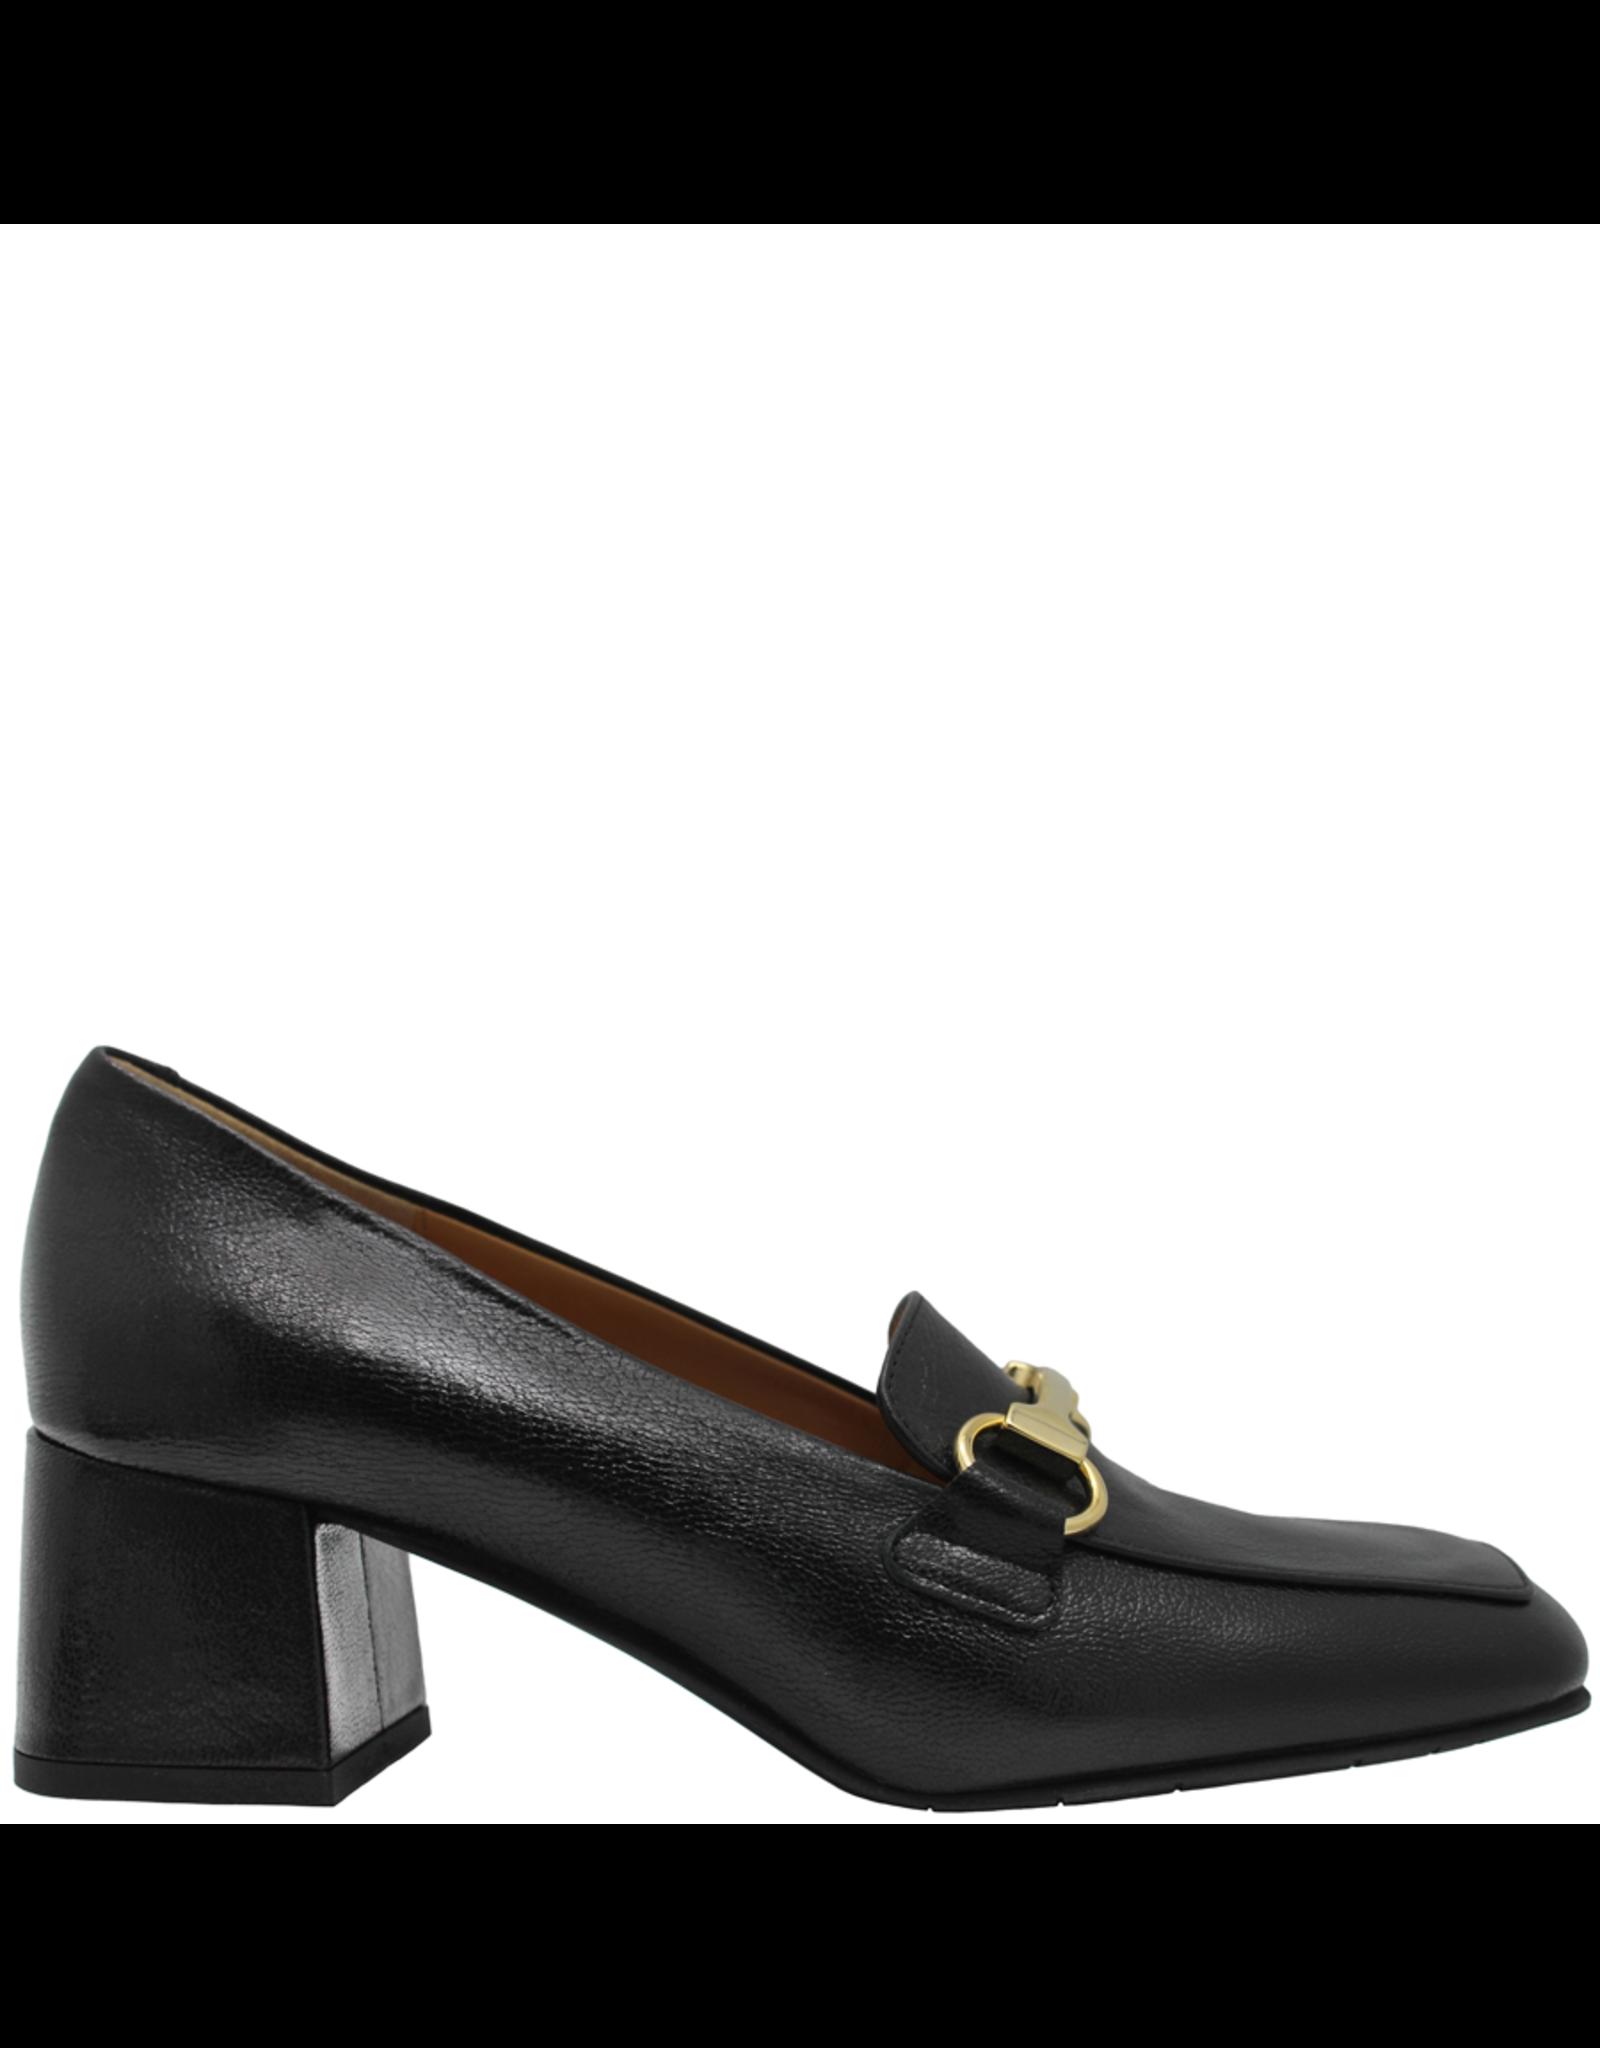 ModadiFausto ModadiFausto Black Square Toe Medium Heel Loafer 6342